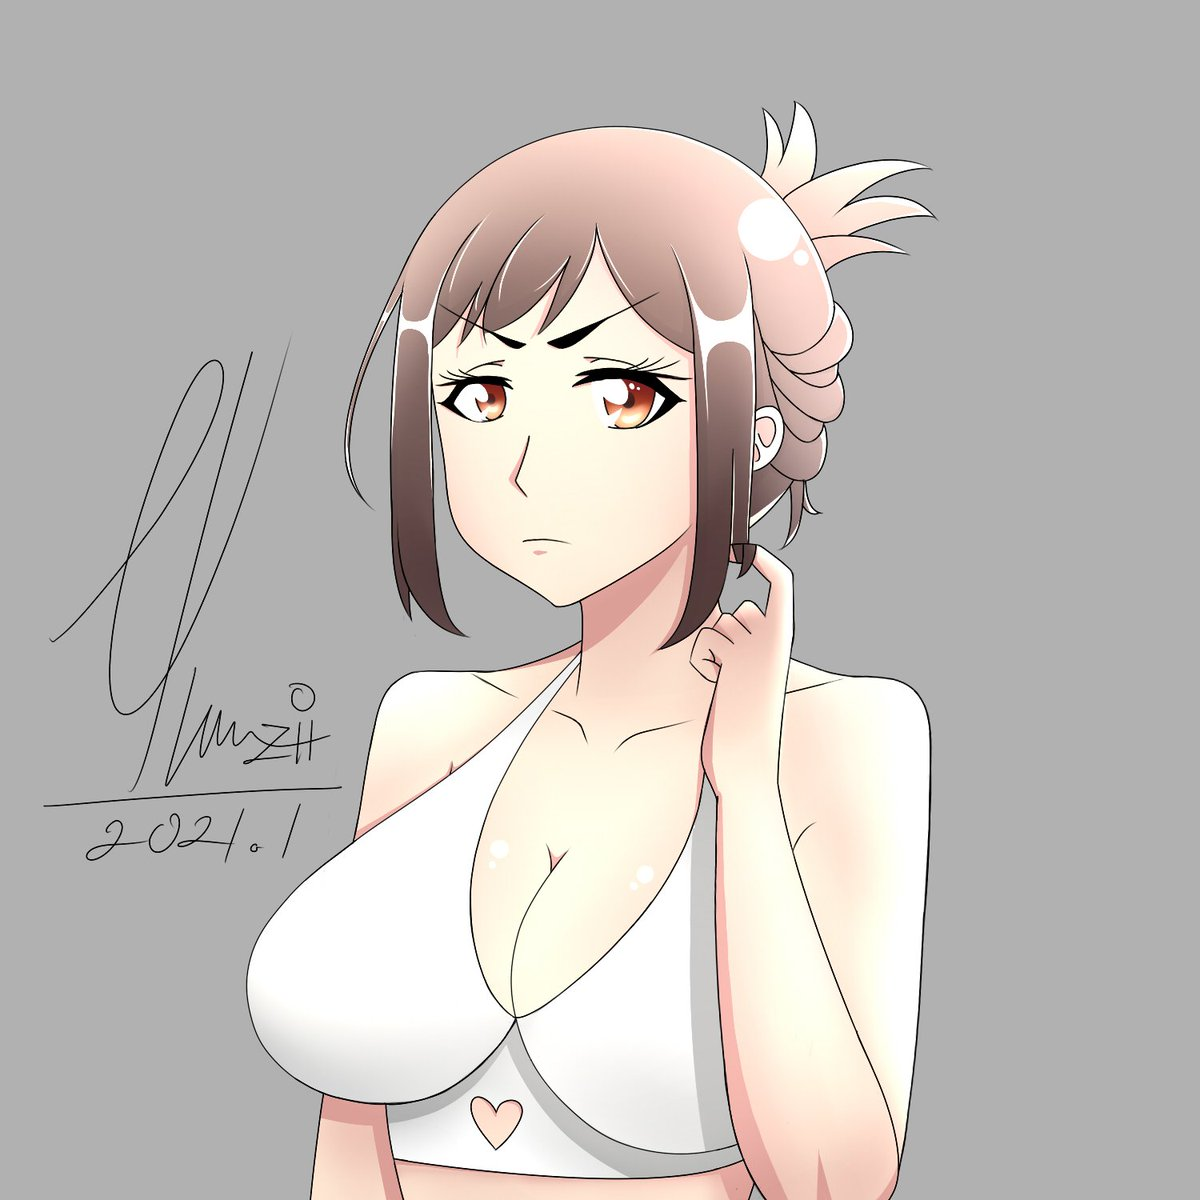 Kanna-chan XD from Nande Koko ni Sensei ga! #illustration #fanart #kanna #anime #manga #nandekokonisenseiga